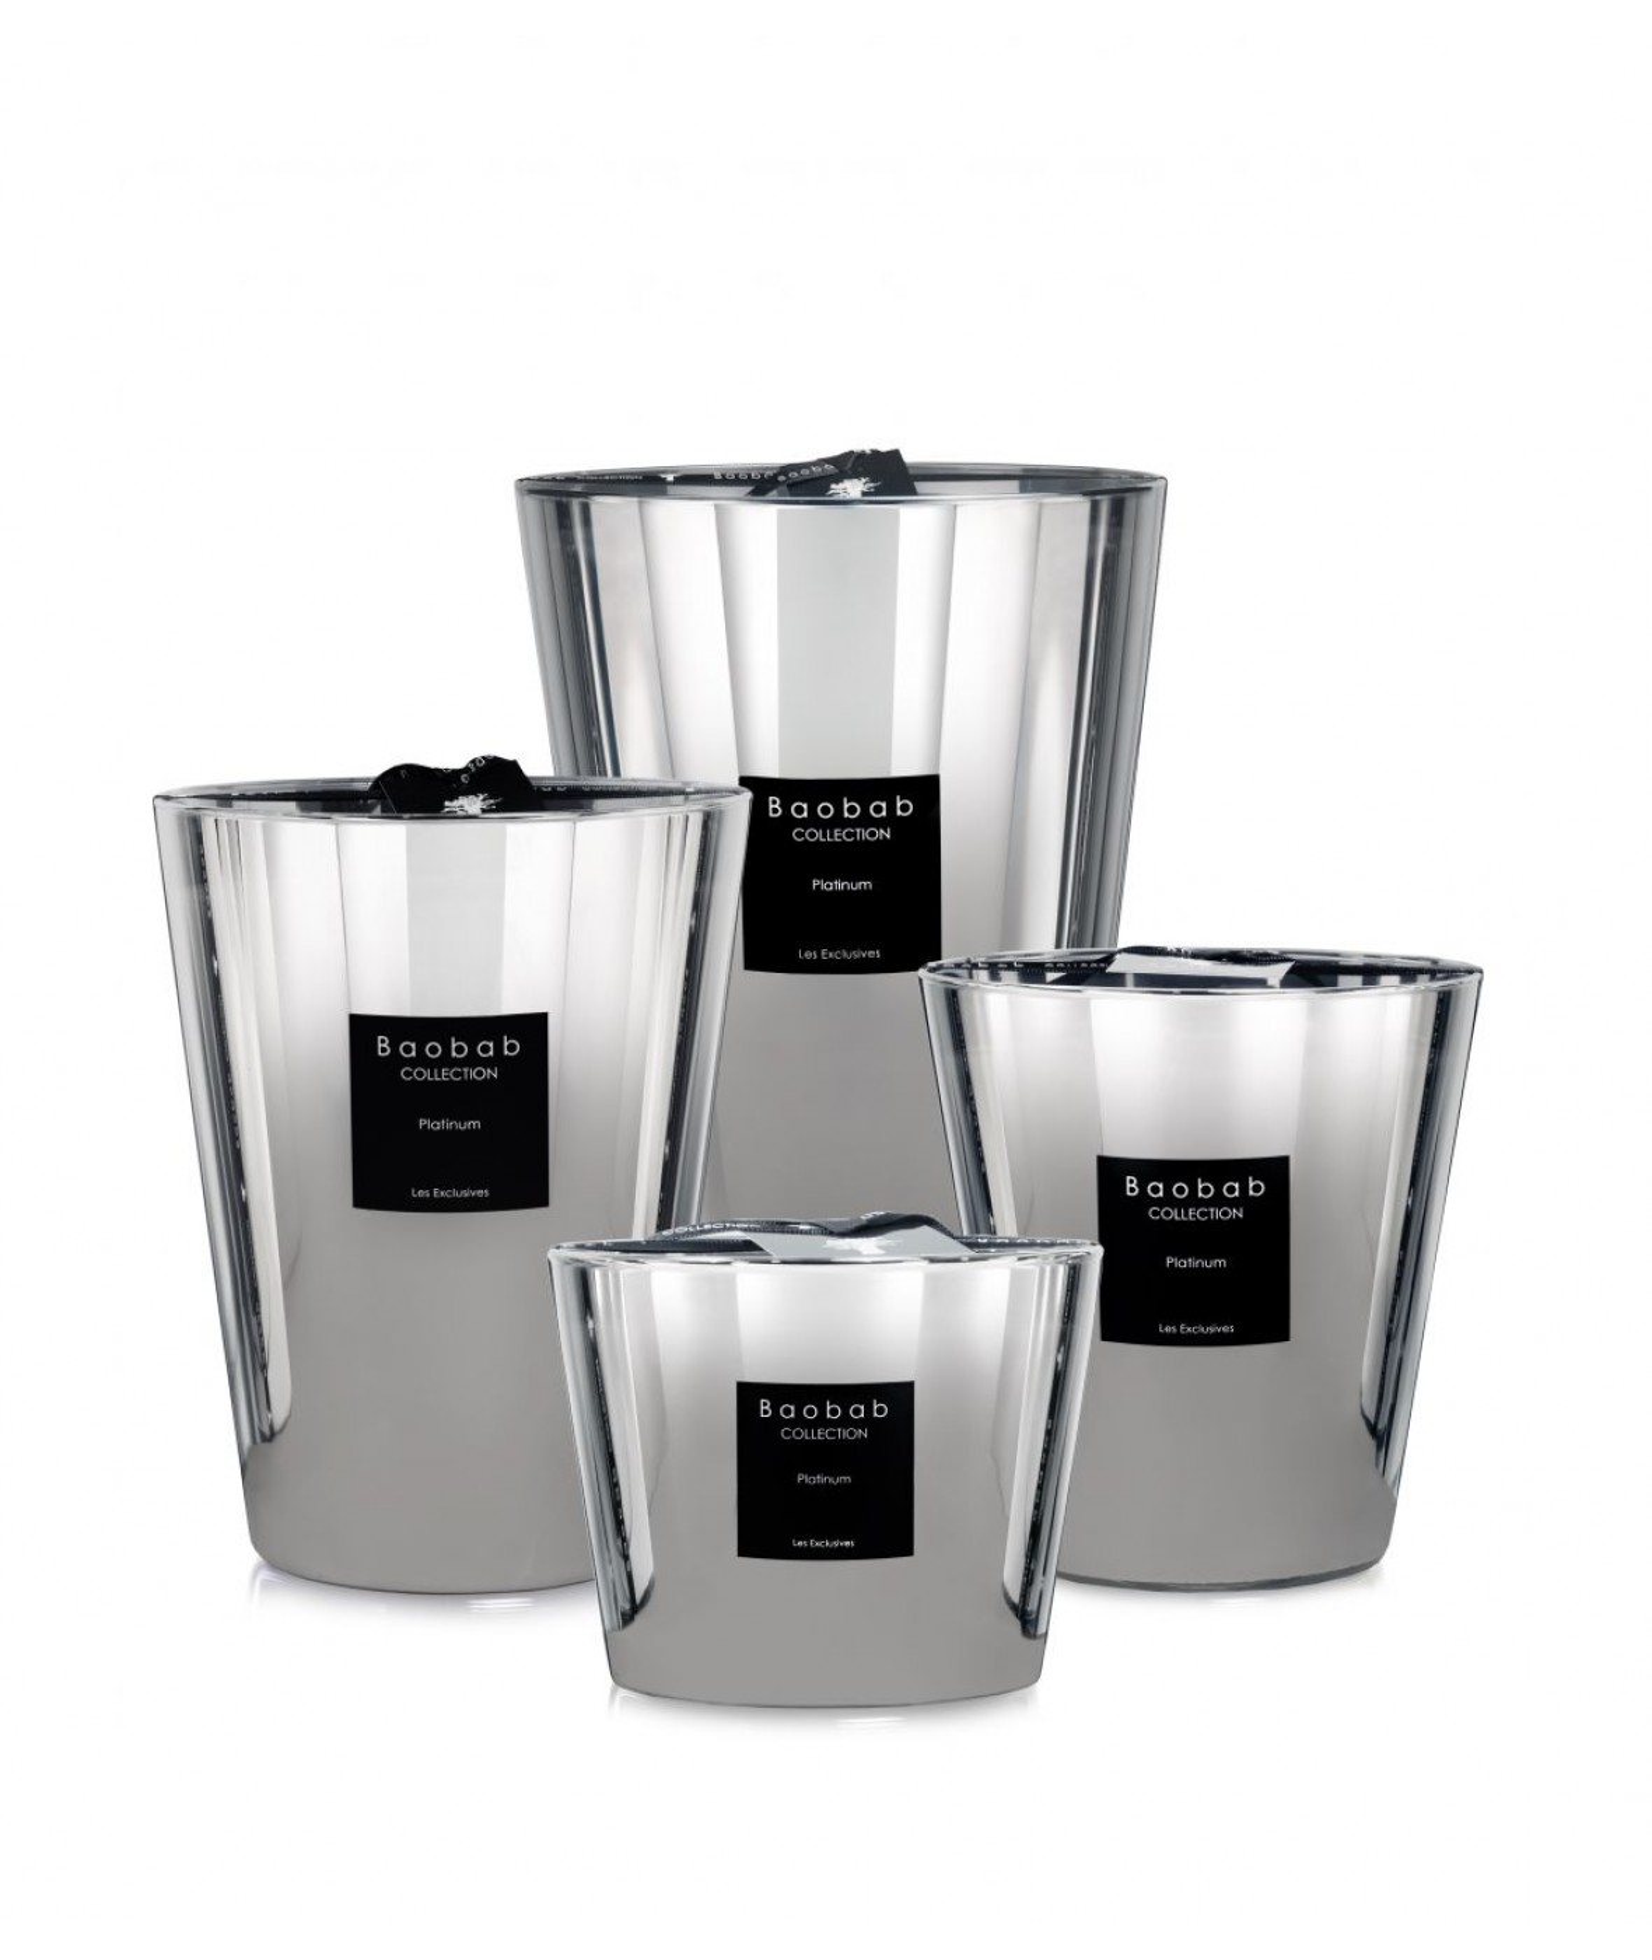 Baobap Scented Candles Platinum (Set)